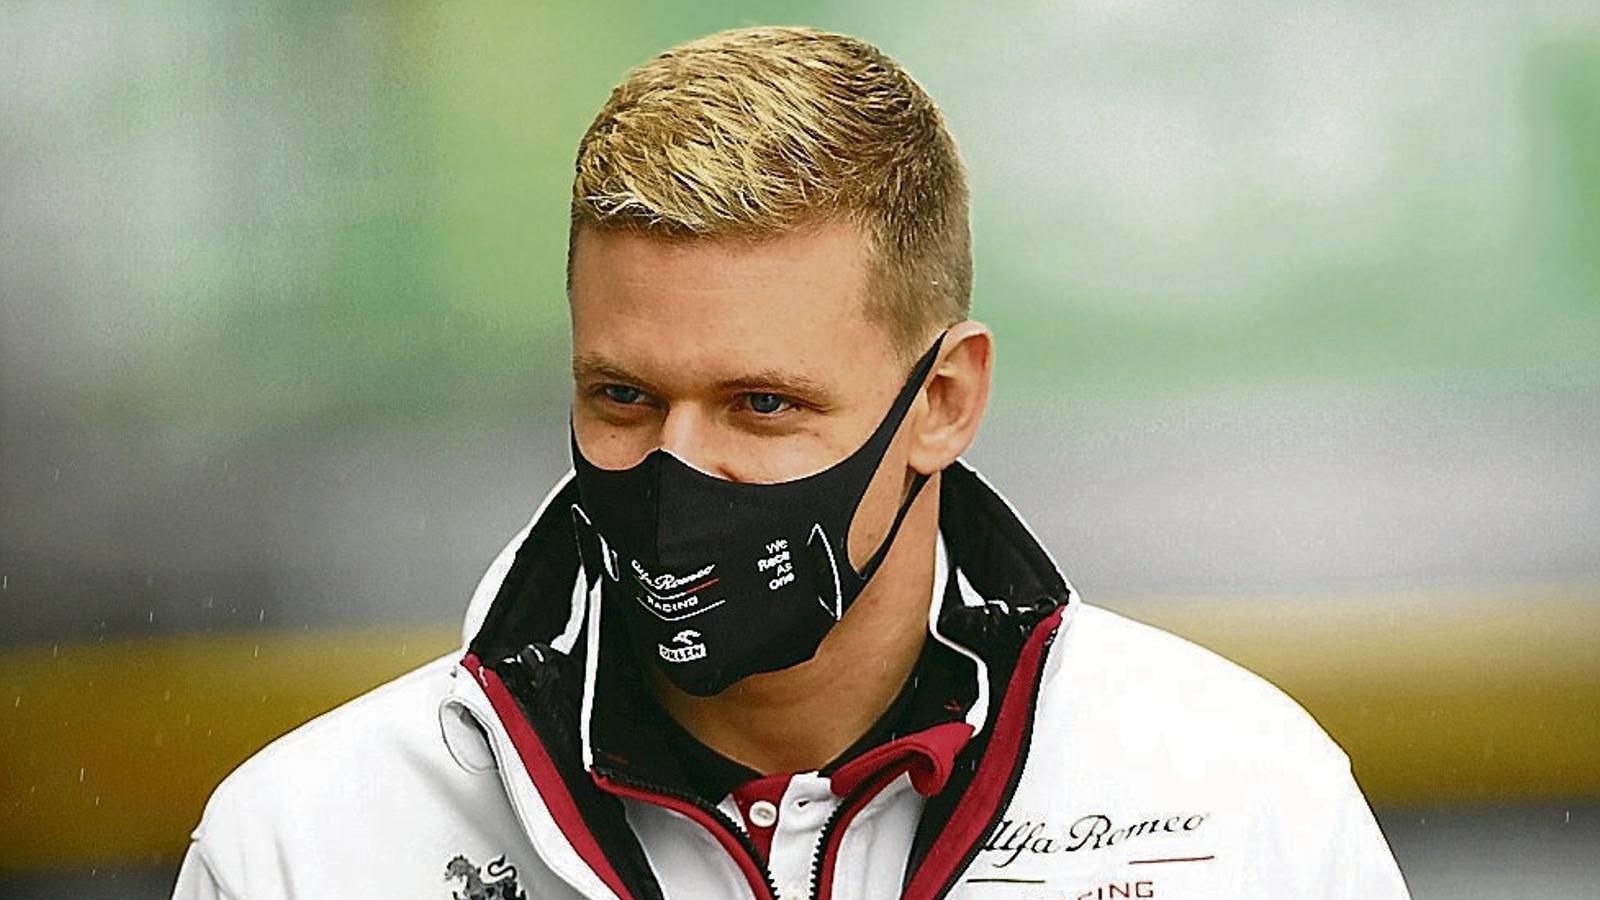 Mick Schumacher passejant-se pel circuit del GP d'Eifel.